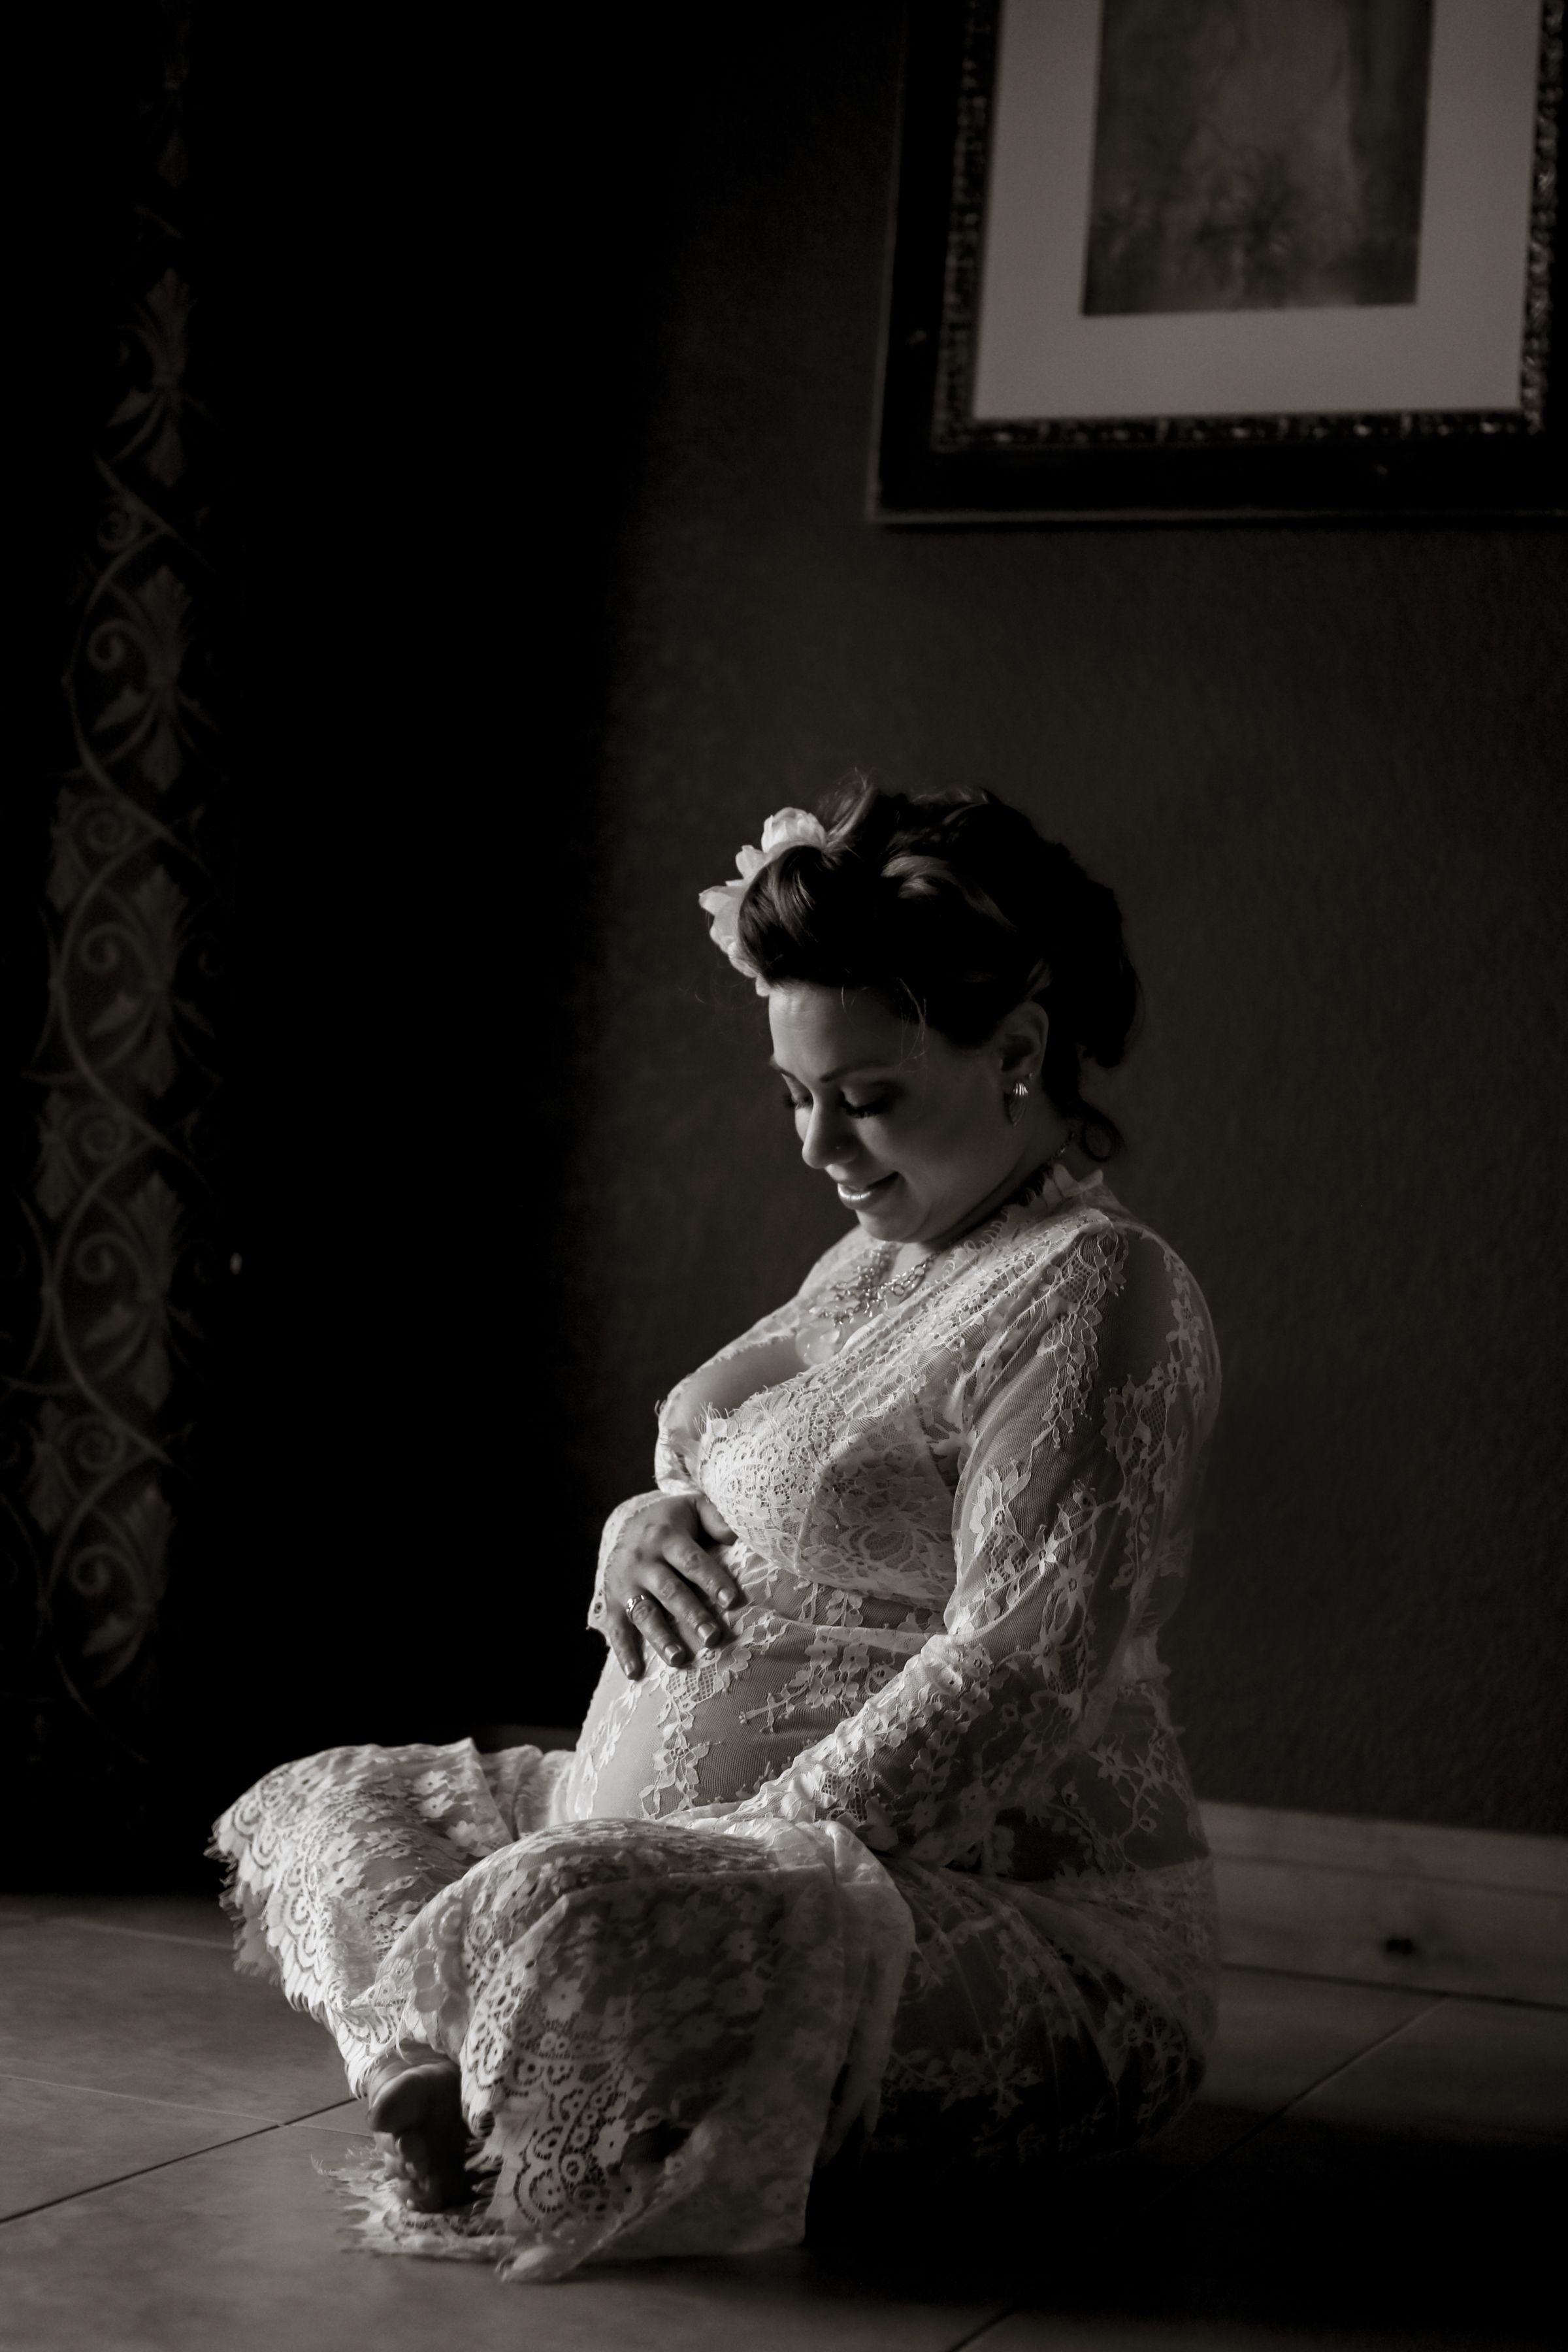 AMA Colorado Maternity Photography   Expecting Photography   Pregnancy Photography